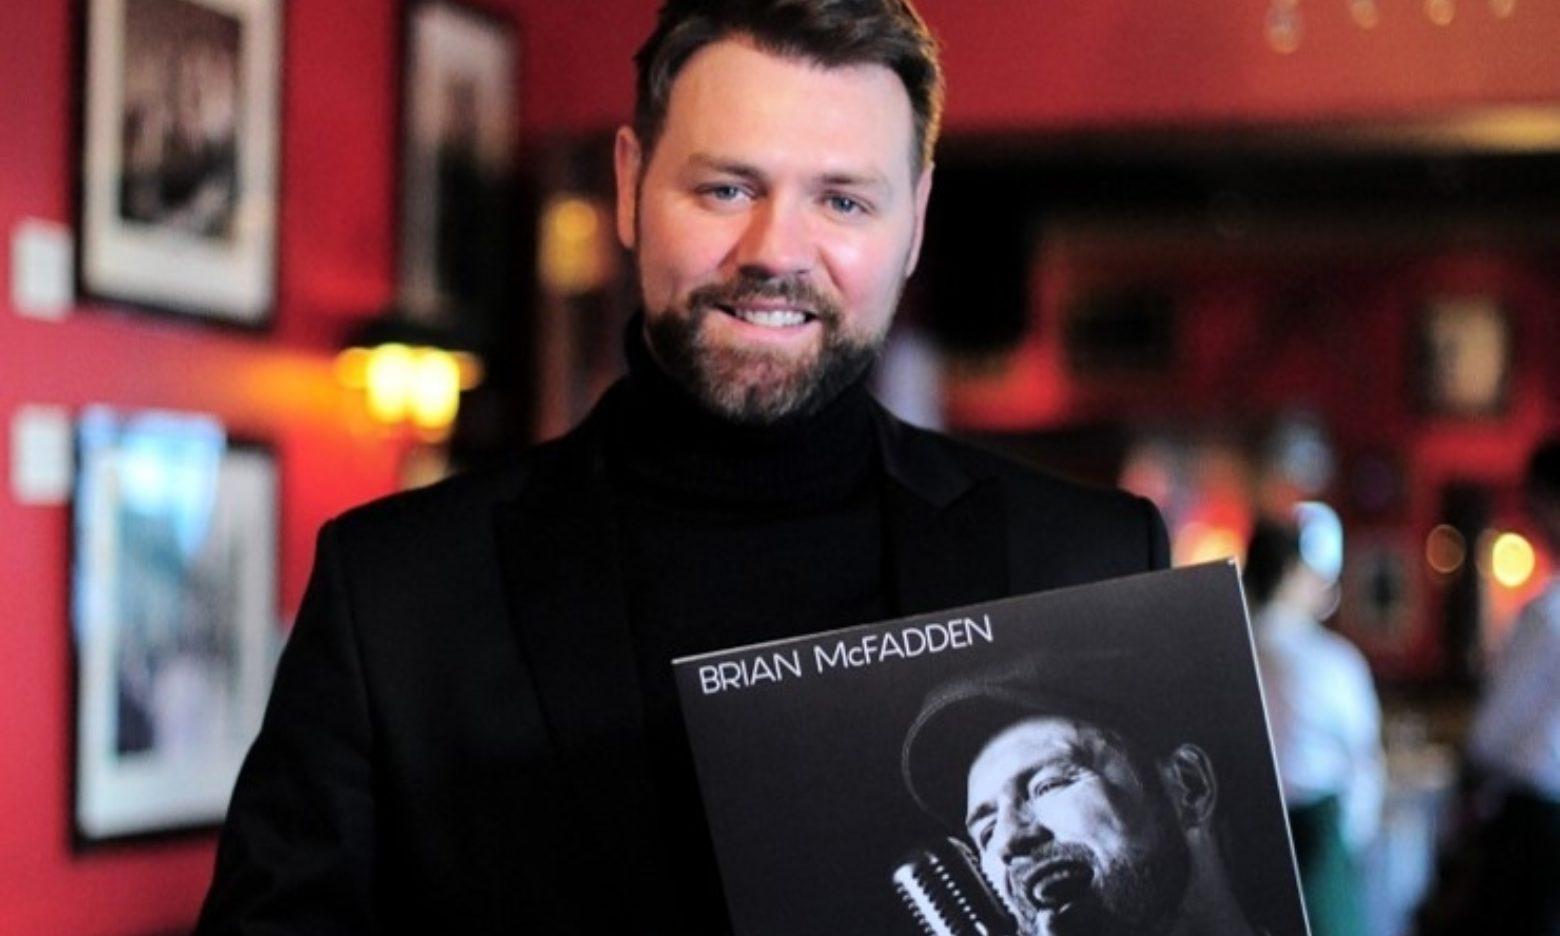 BOISDALE MUSIC AWARDS 2018  HOSTED BY JOOLS HOLLAND & FERNE MCCANN